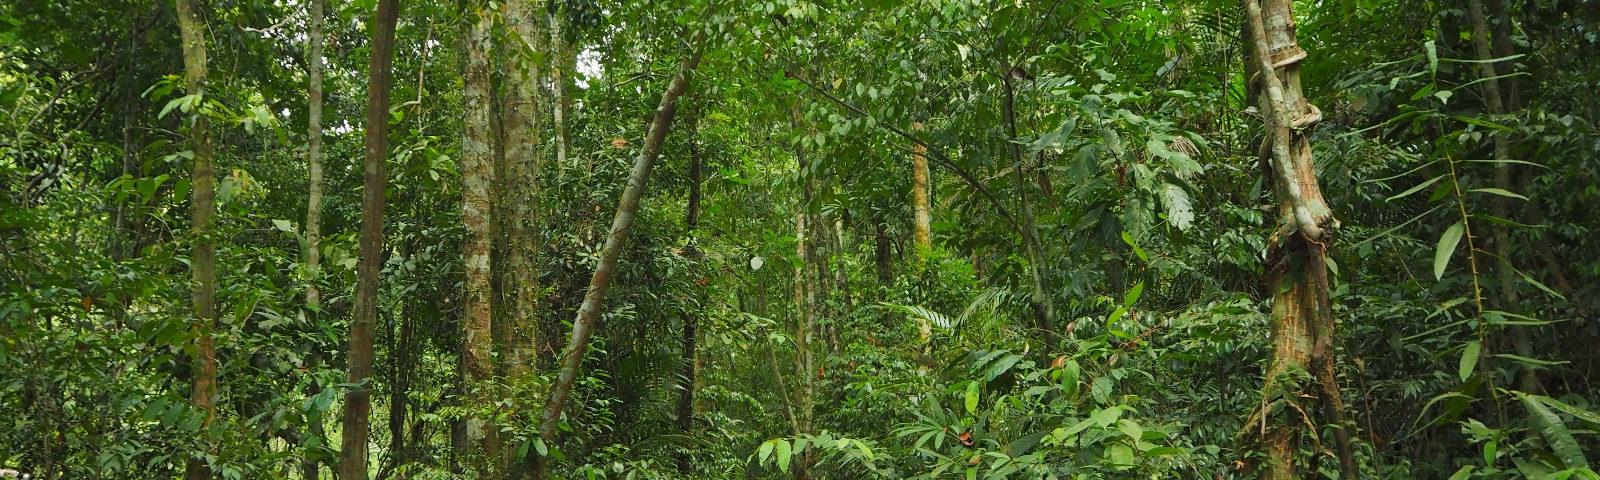 Thailand Koh Chang Khlong Phlu Regenwald